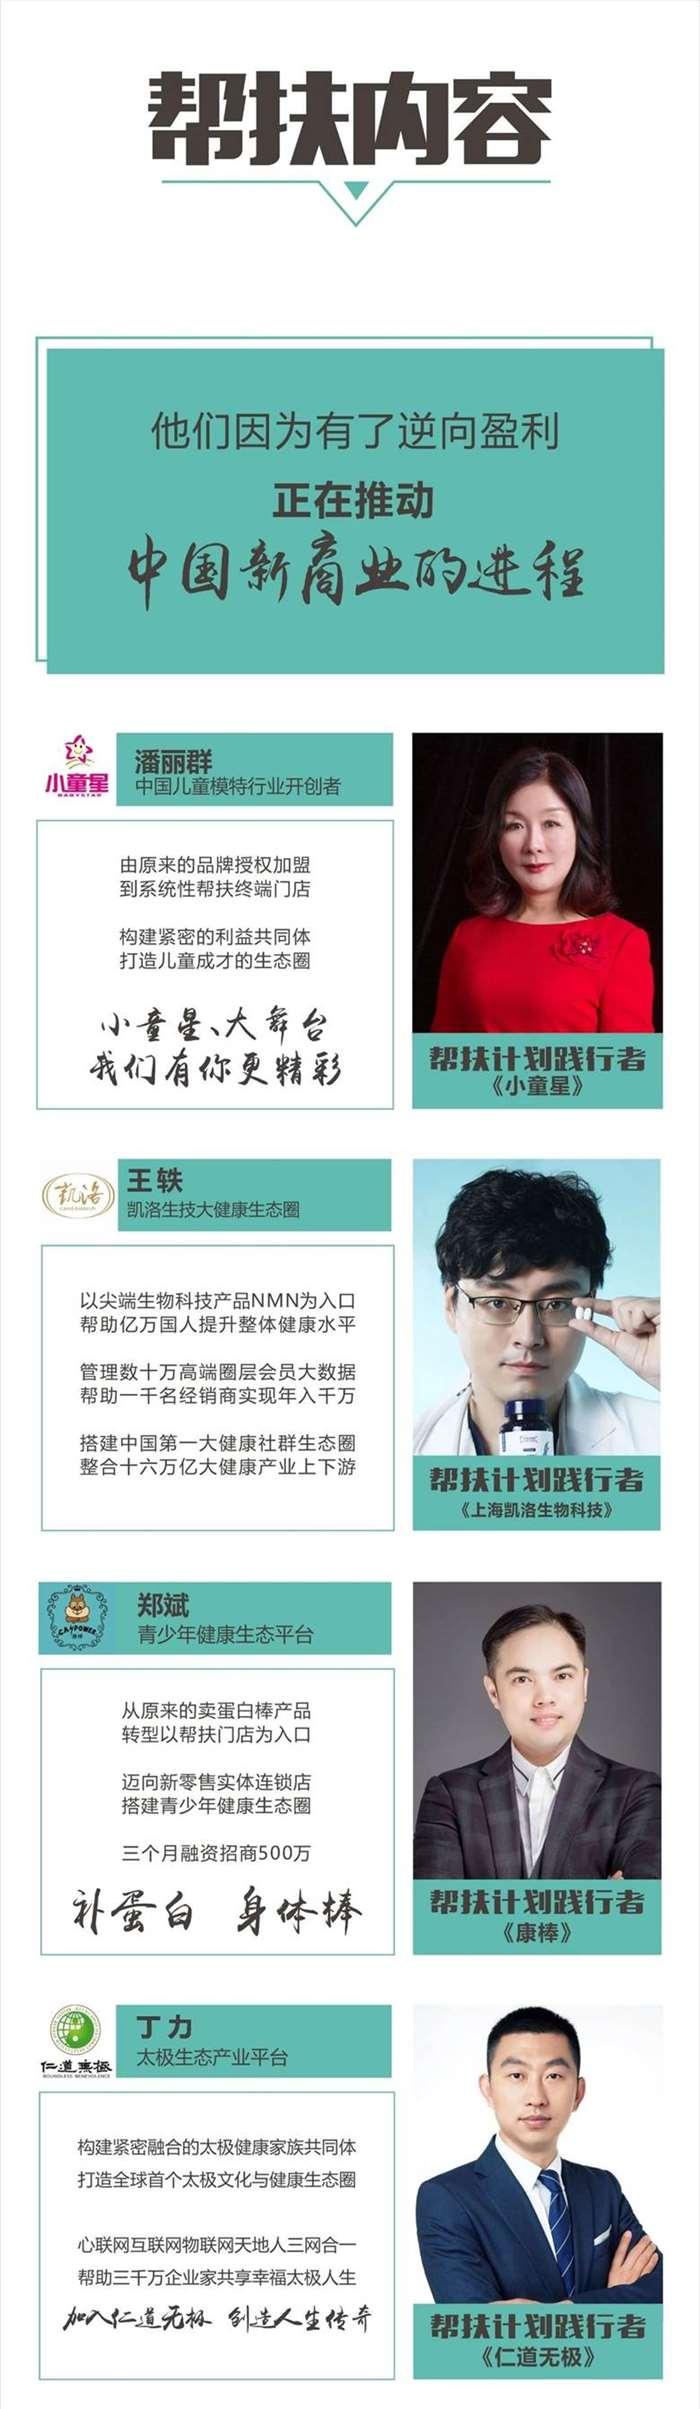 http://www.huodongxing.com/file/20191113/1063603644976/483643589767492.jpg